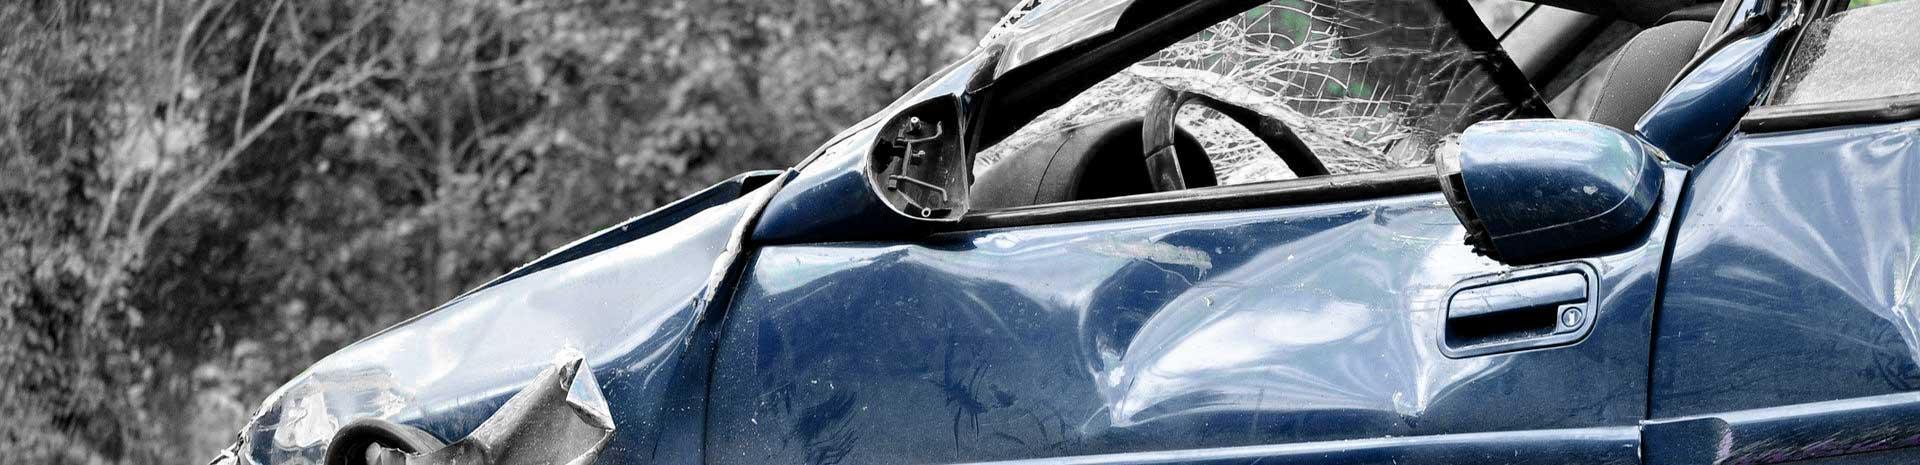 Aantal verkeersslachtoffers moet worden verminderd | Letselschadebureau LetselPro